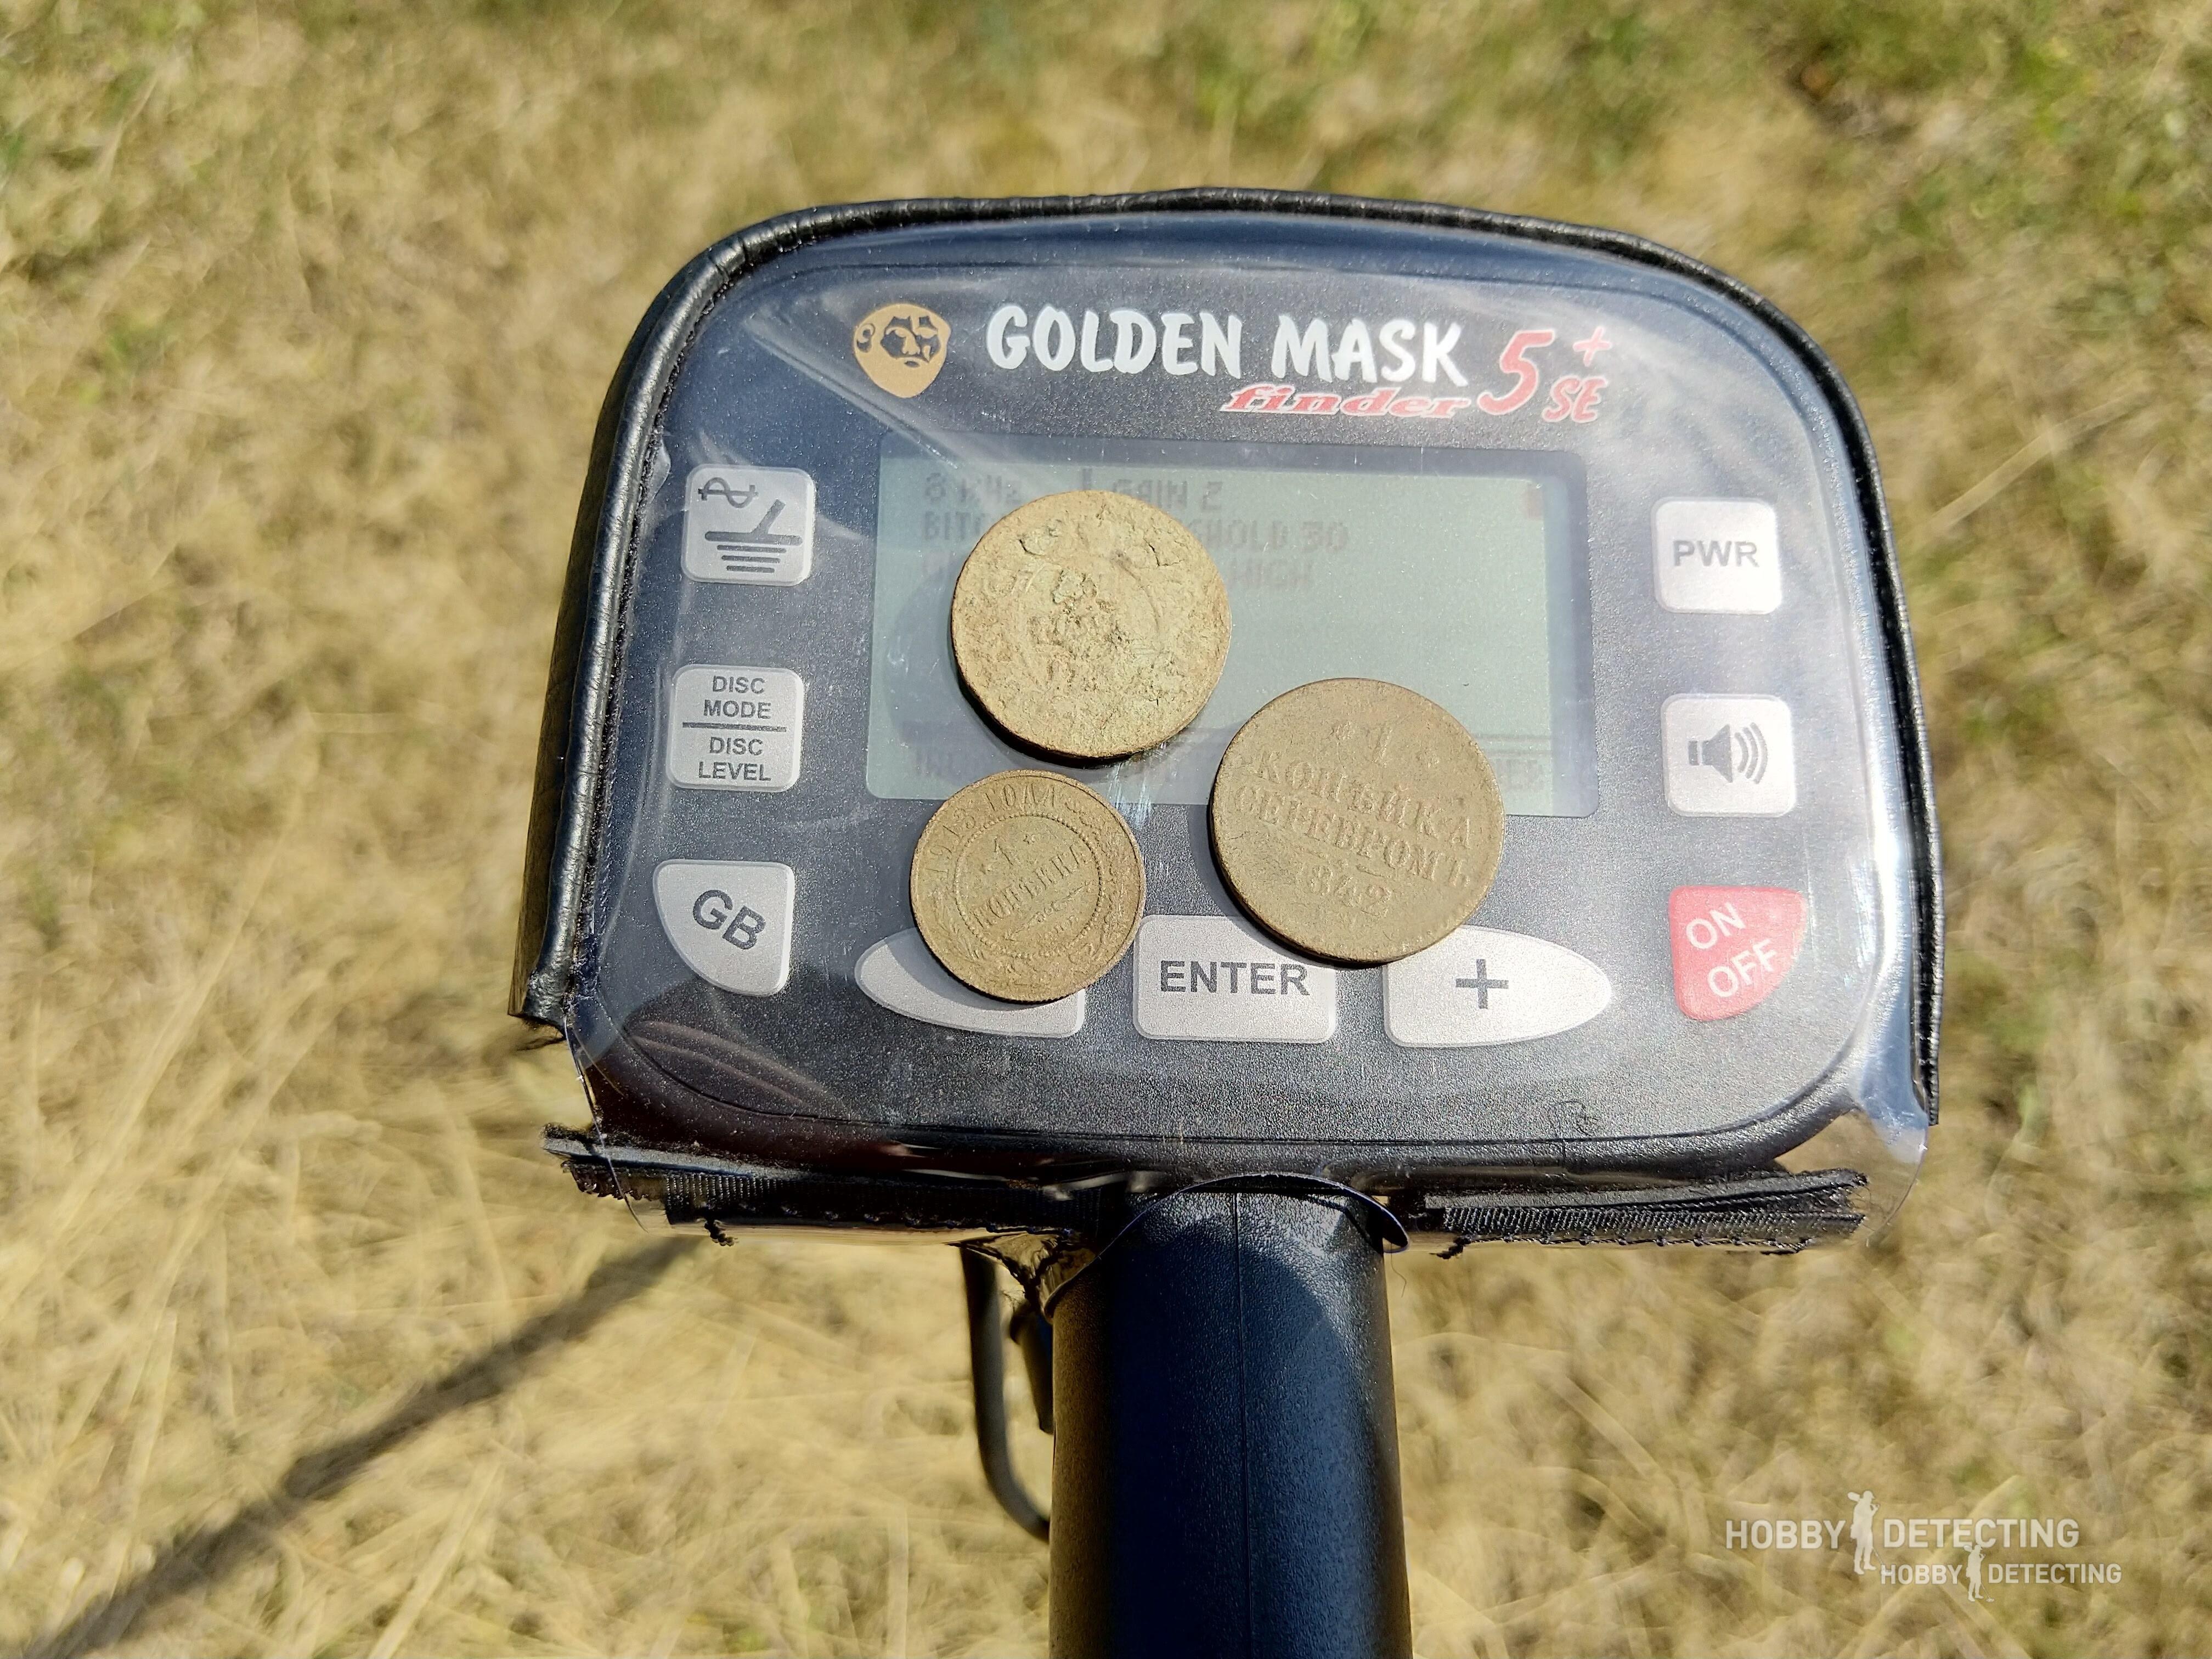 Golden Mask 5 Plus SE 15-30 kHz Грунтовый металлоискатель Golden mask